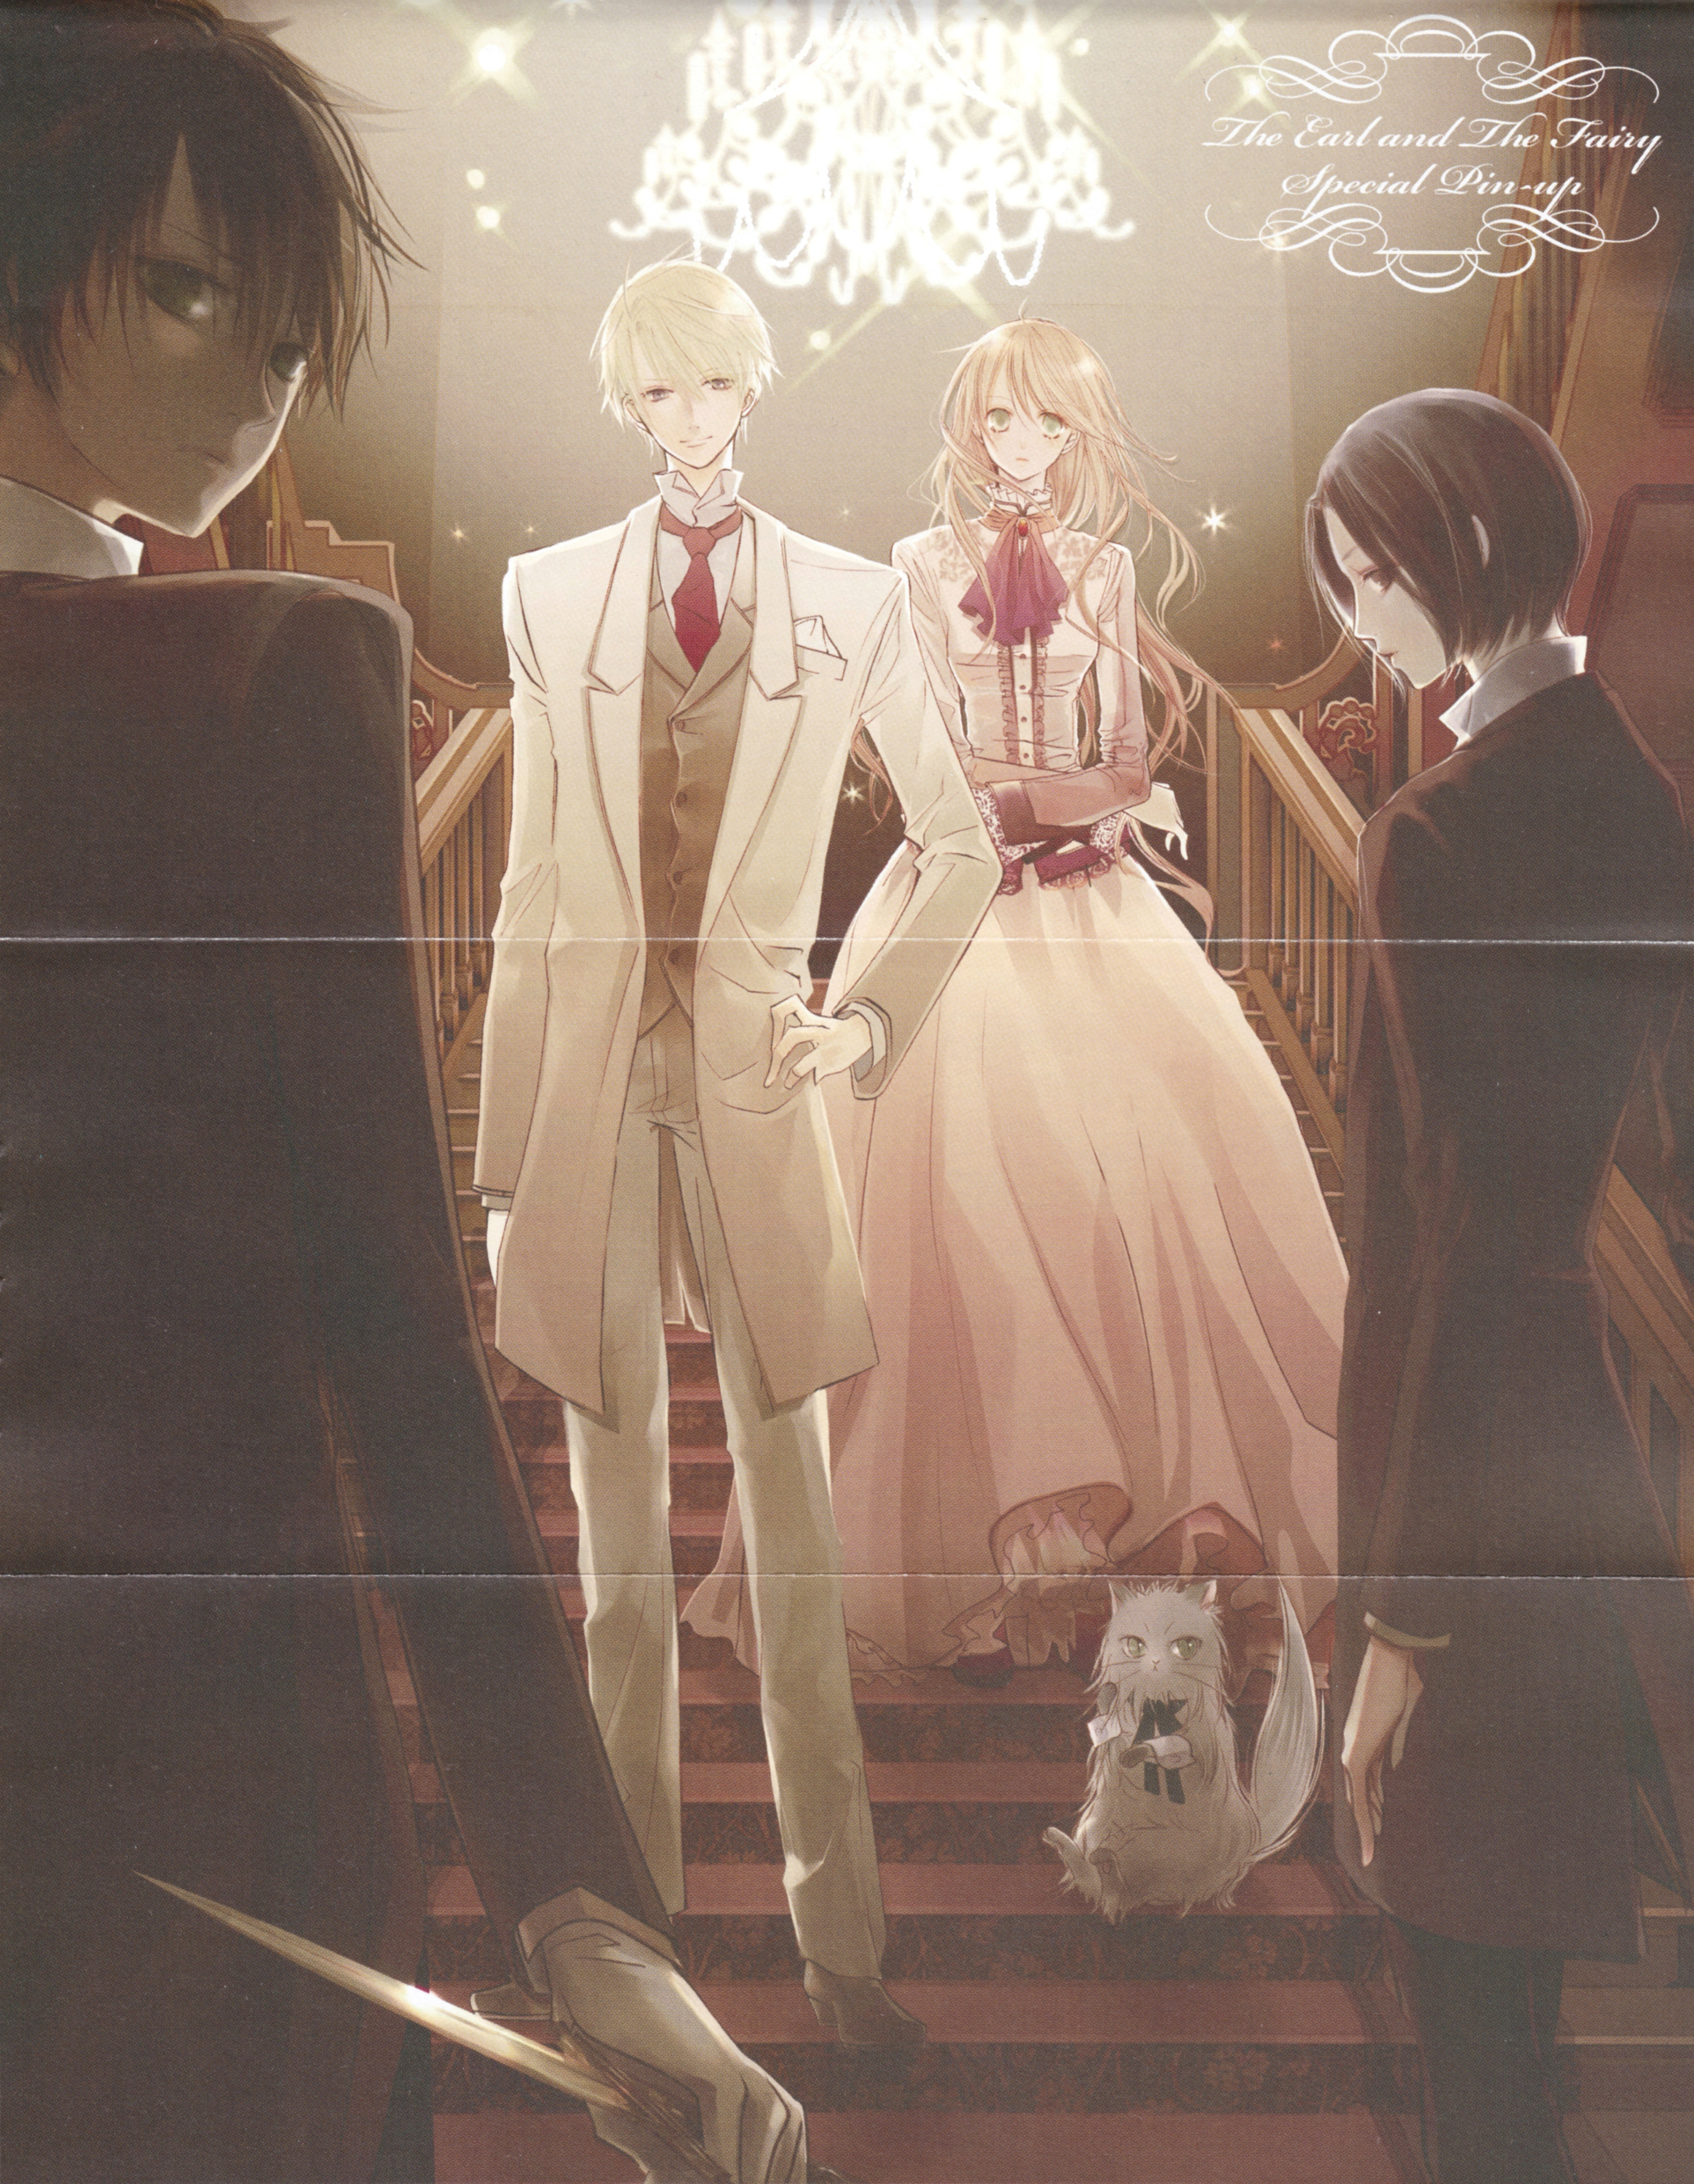 Earl and fairy wedding